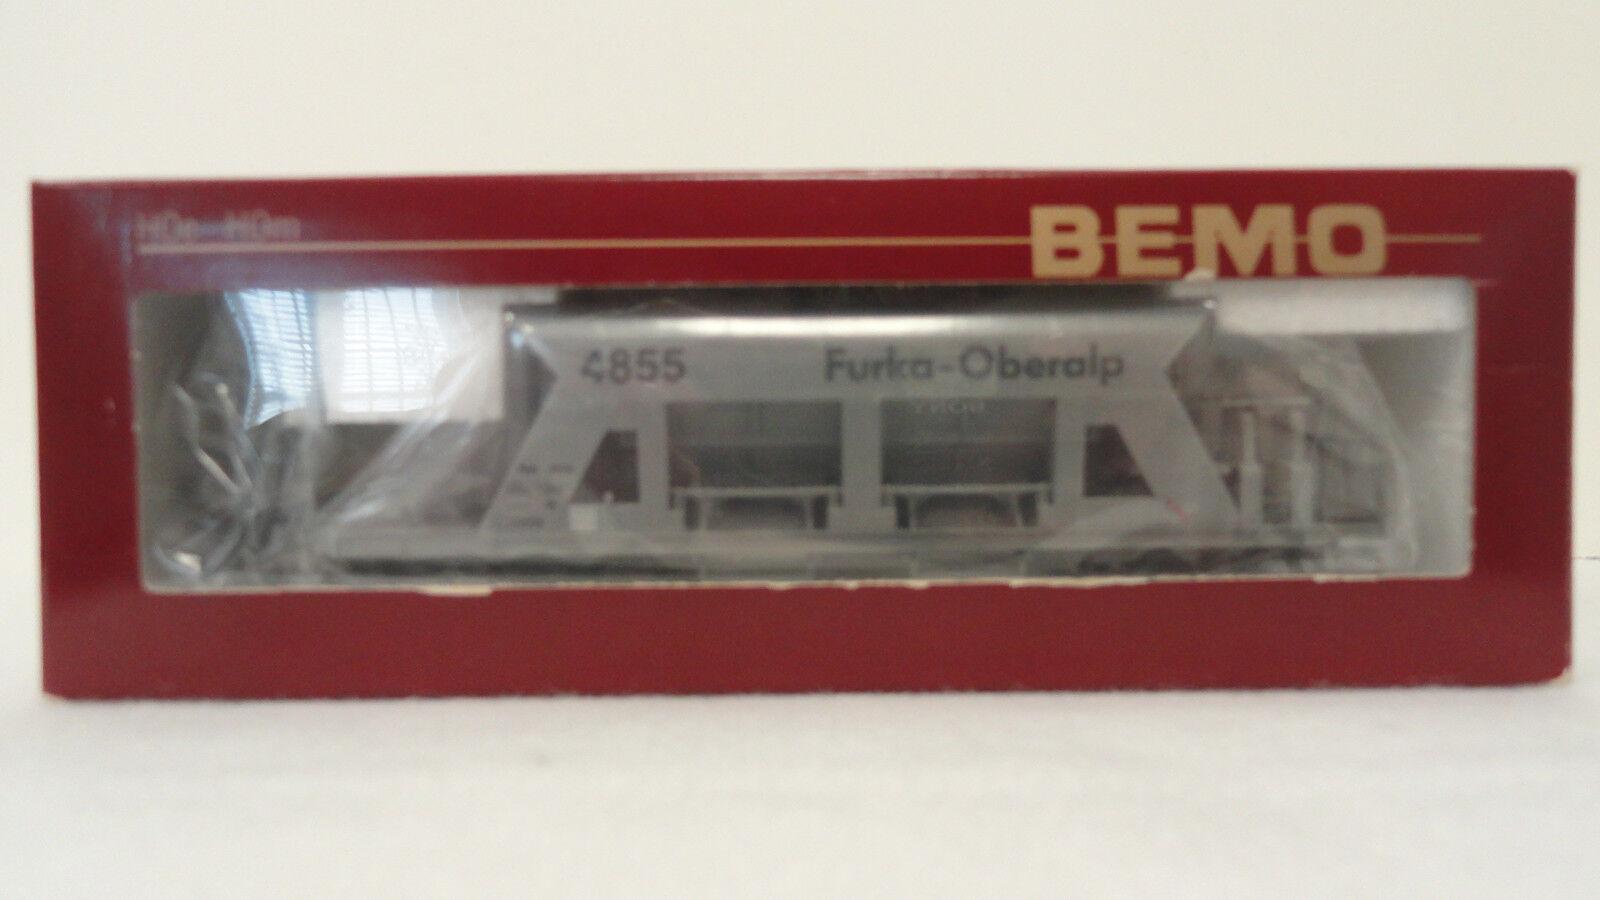 Bemo HOm 2287 215 FO FAD 4855 Kiestransportwagen (gravel car) grau. NIB.